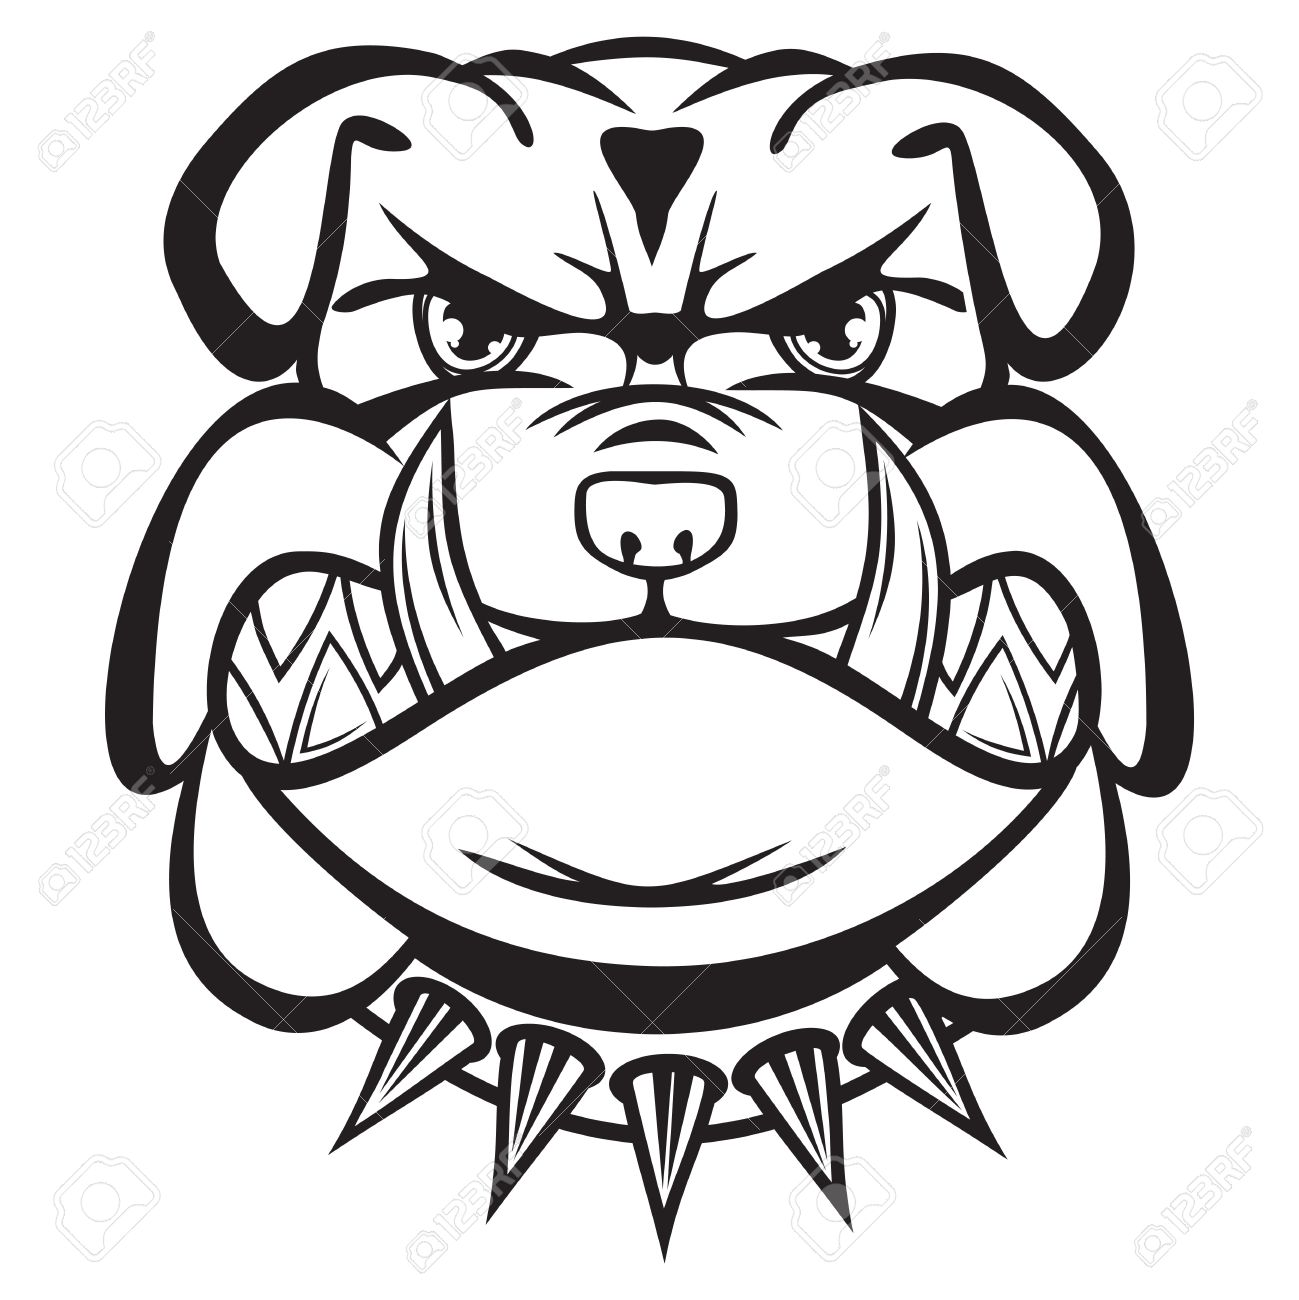 Angry Bulldog Head Black And White Royalty Free Cliparts Vectors